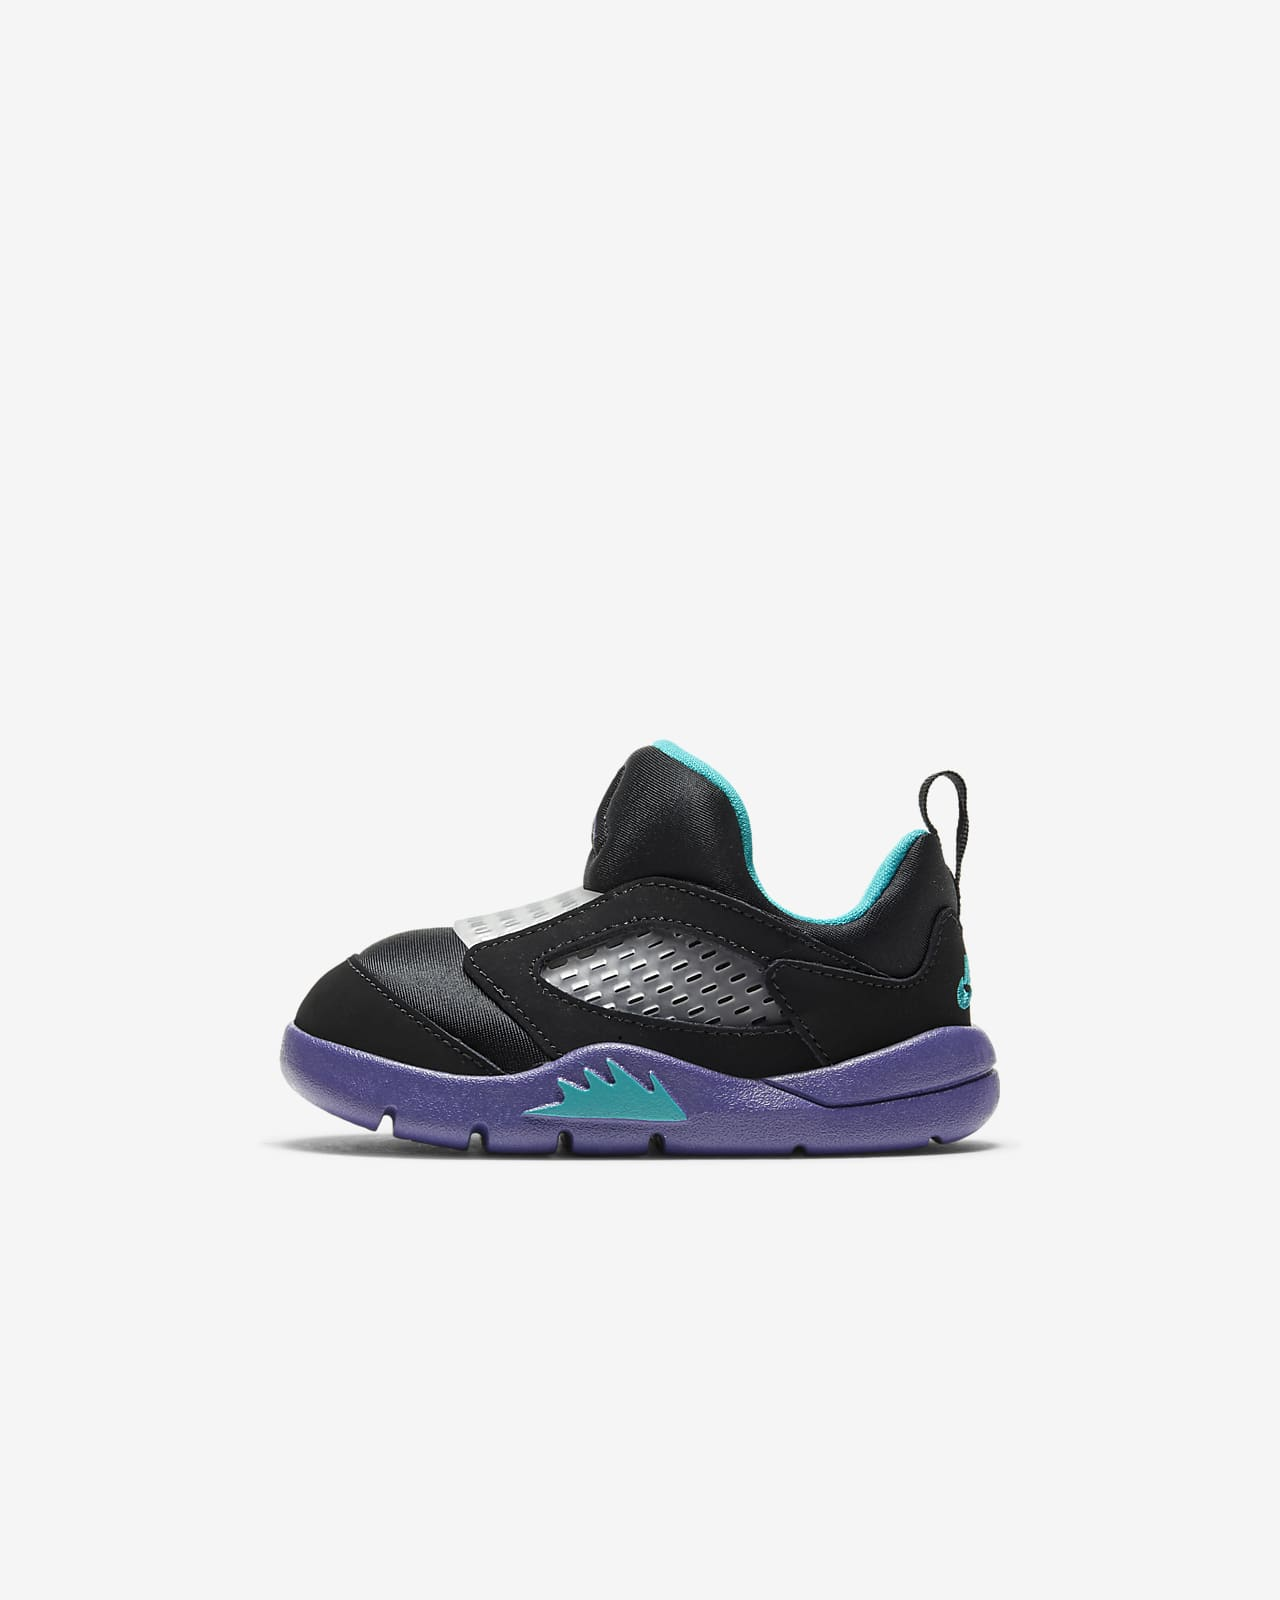 Jordan 5 Retro Little Flex TD 复刻婴童运动童鞋